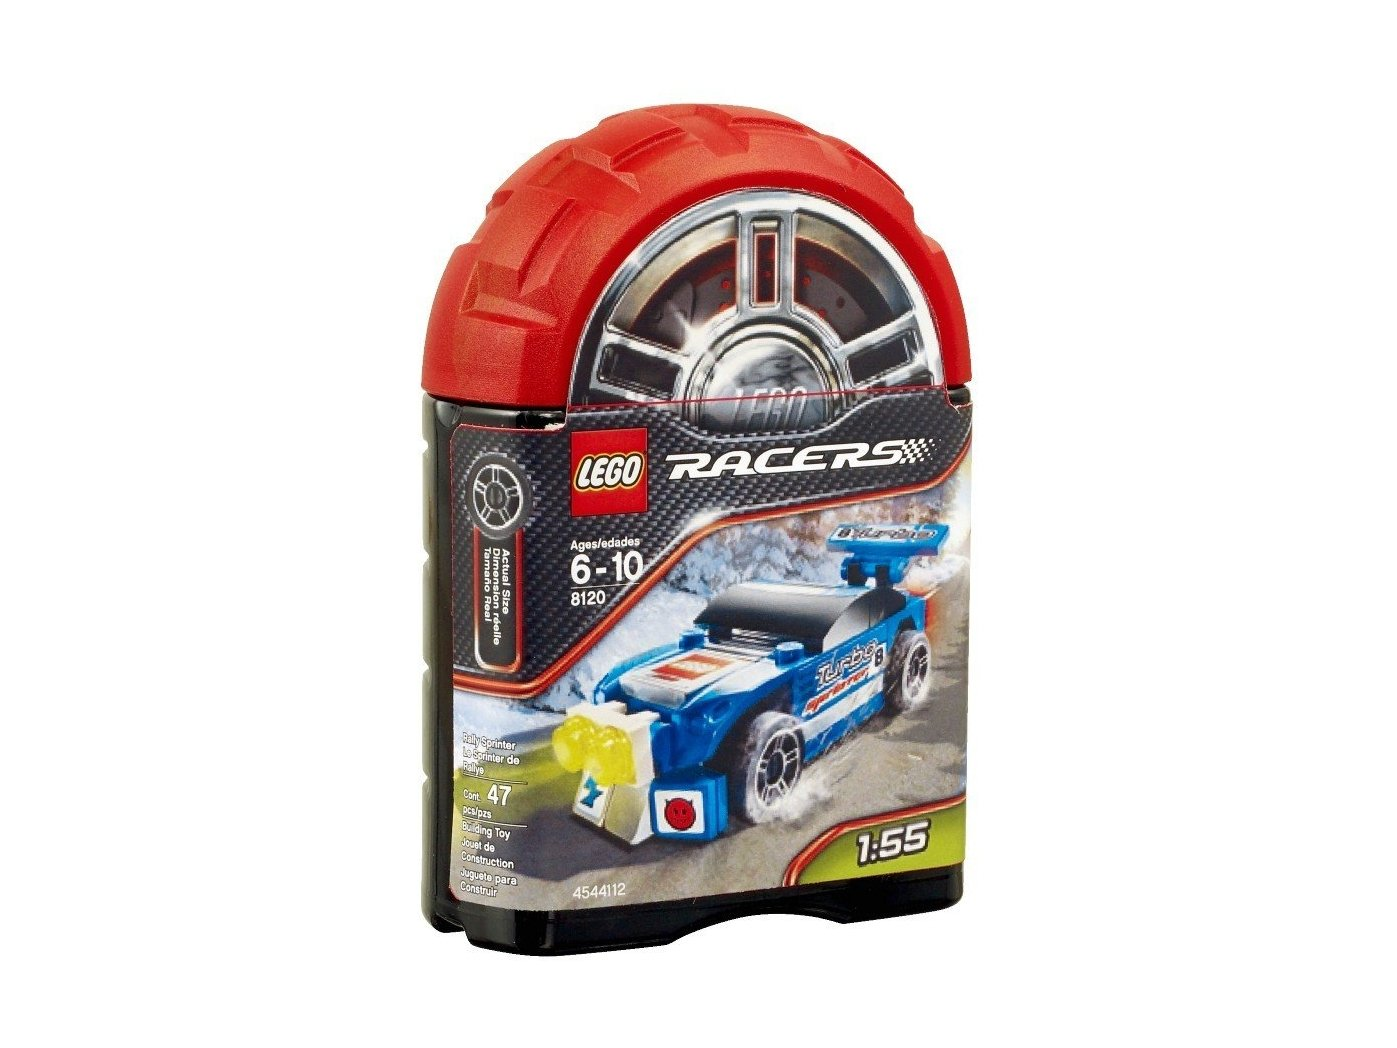 LEGO 8120 Racers Rally Sprinter